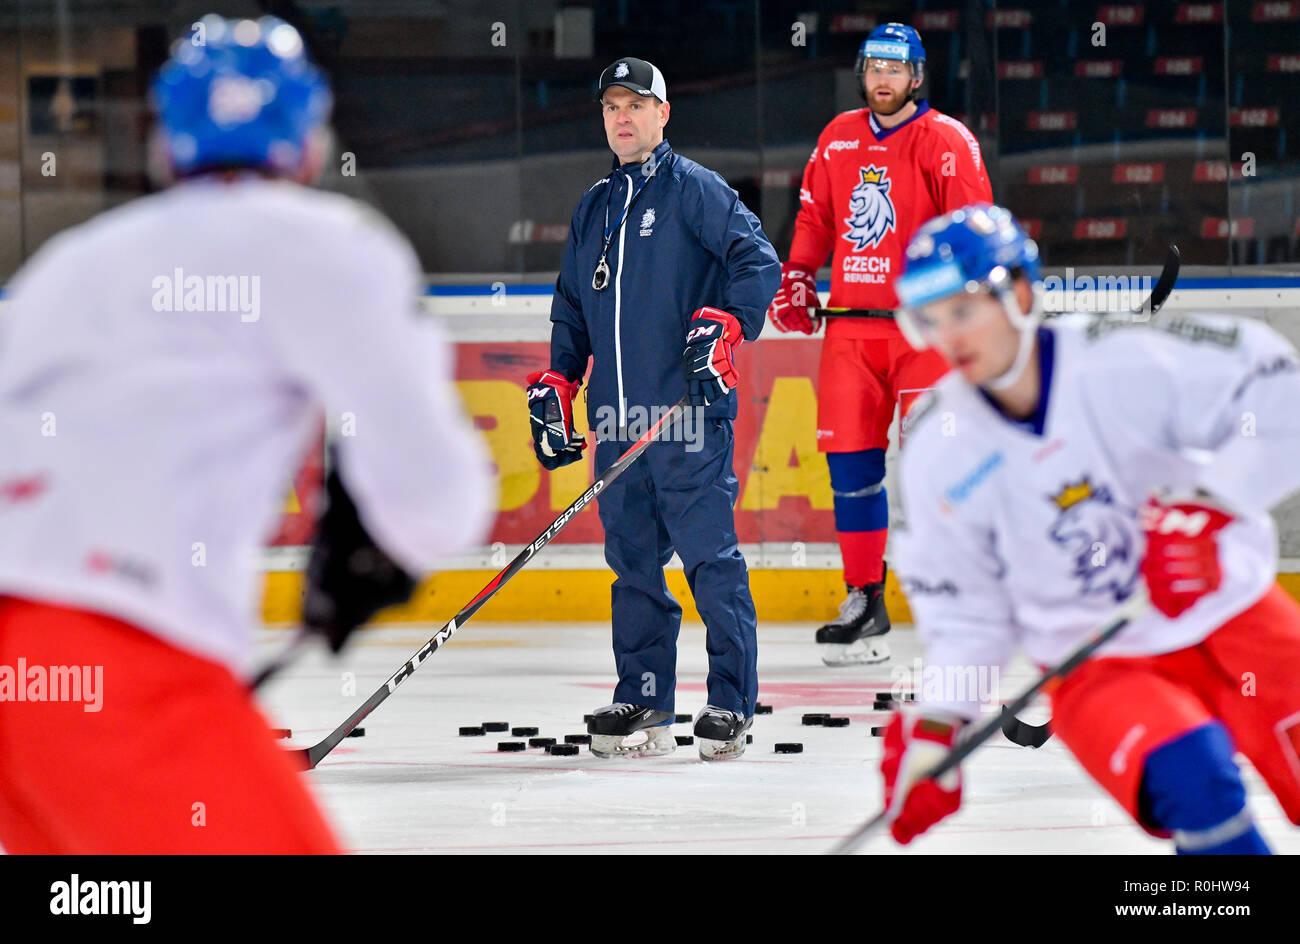 6f17fc9ce3c Team Hockey Coach Tournament Stock Photos   Team Hockey Coach ...